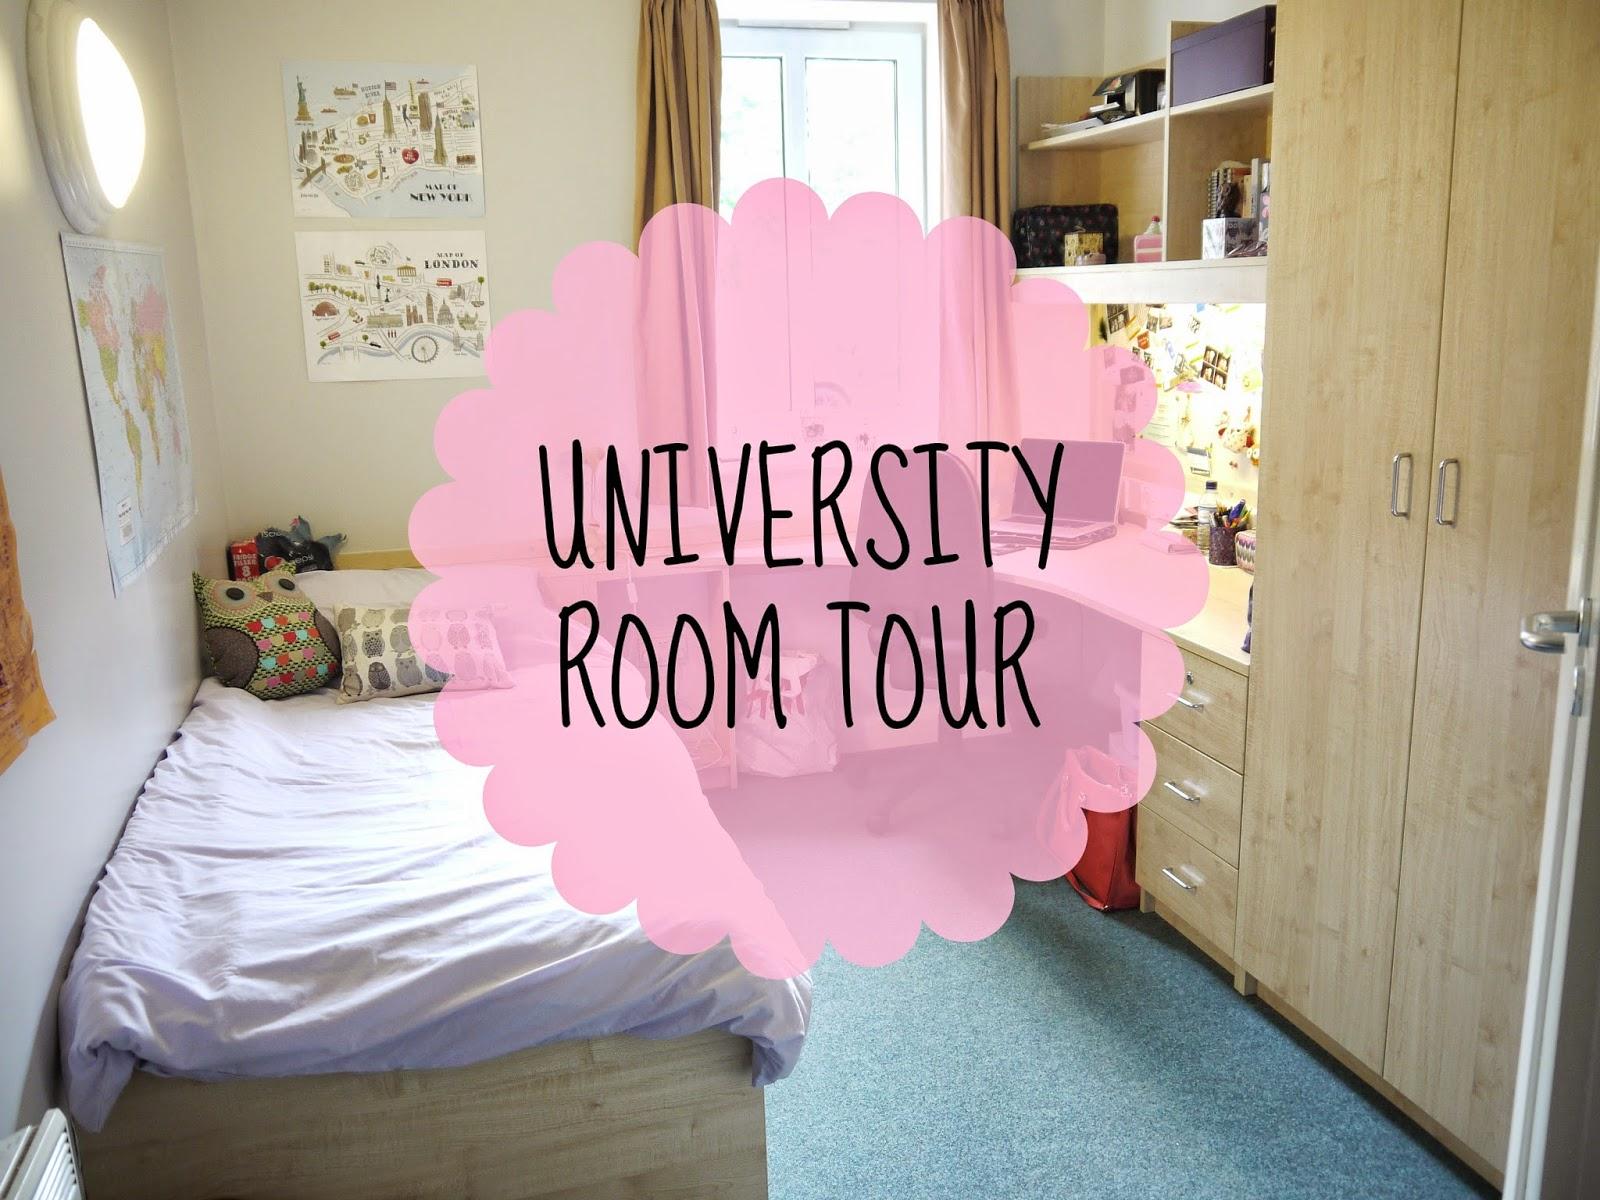 University Room Tour | theOMGdiaries